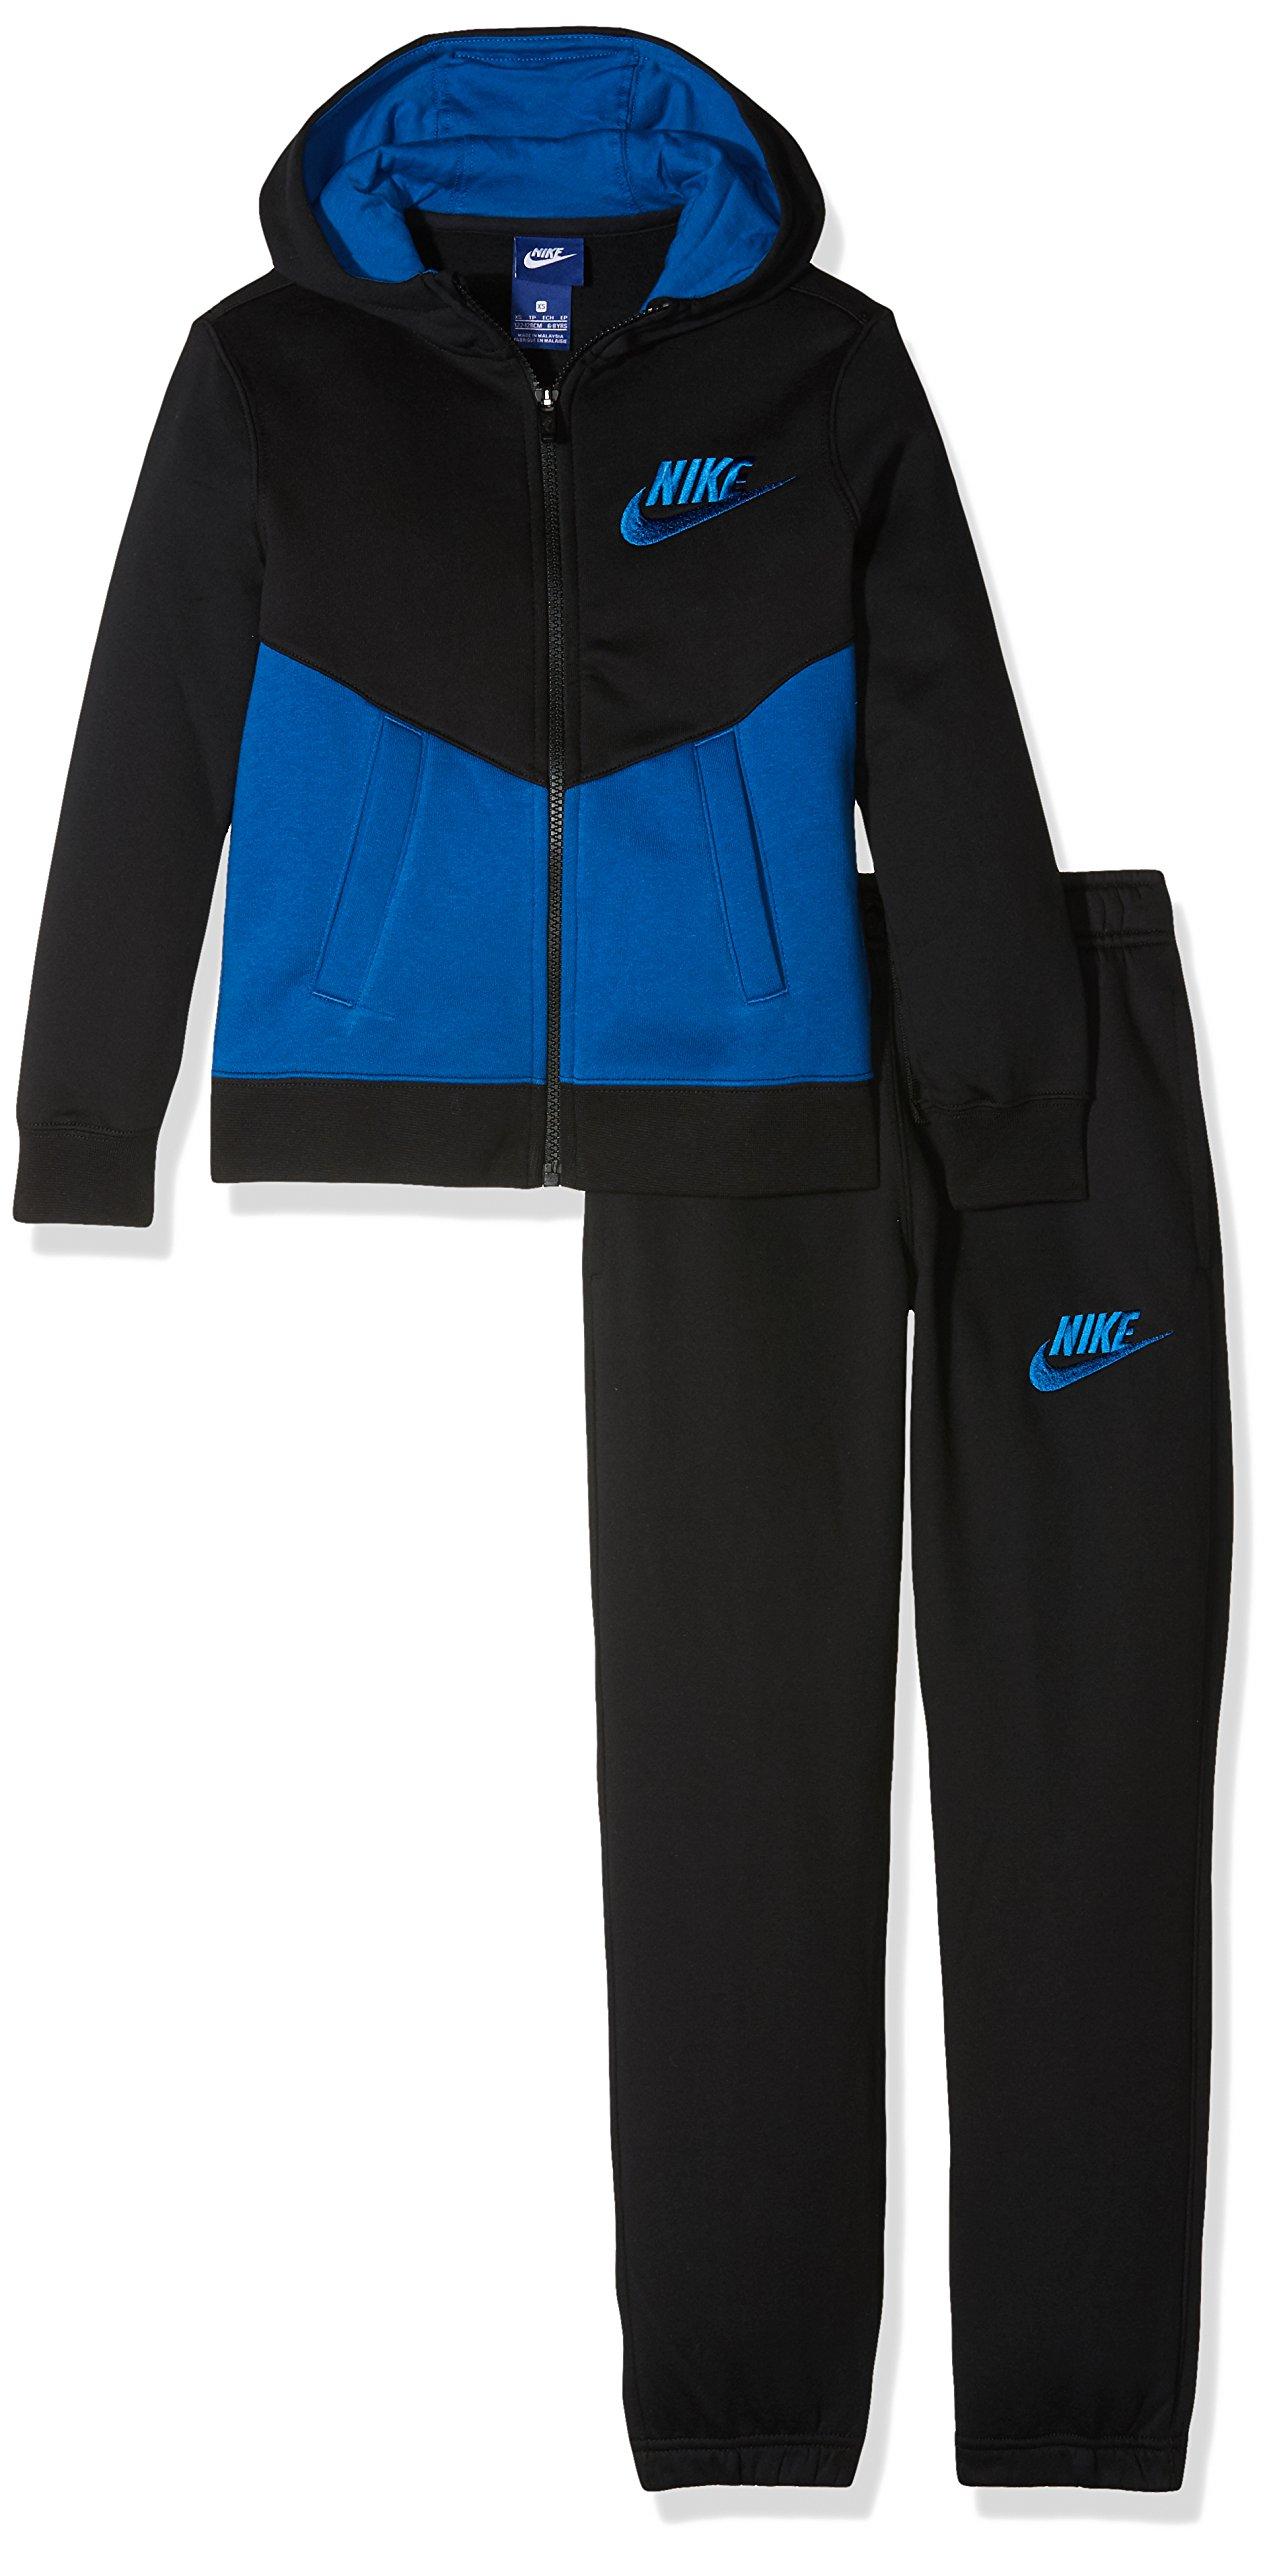 Nike B NSW TRK BF Core tuta, Bambini, Bambino, B Nsw Trk Bf Core, nero (ghiandaia azzurra), XS